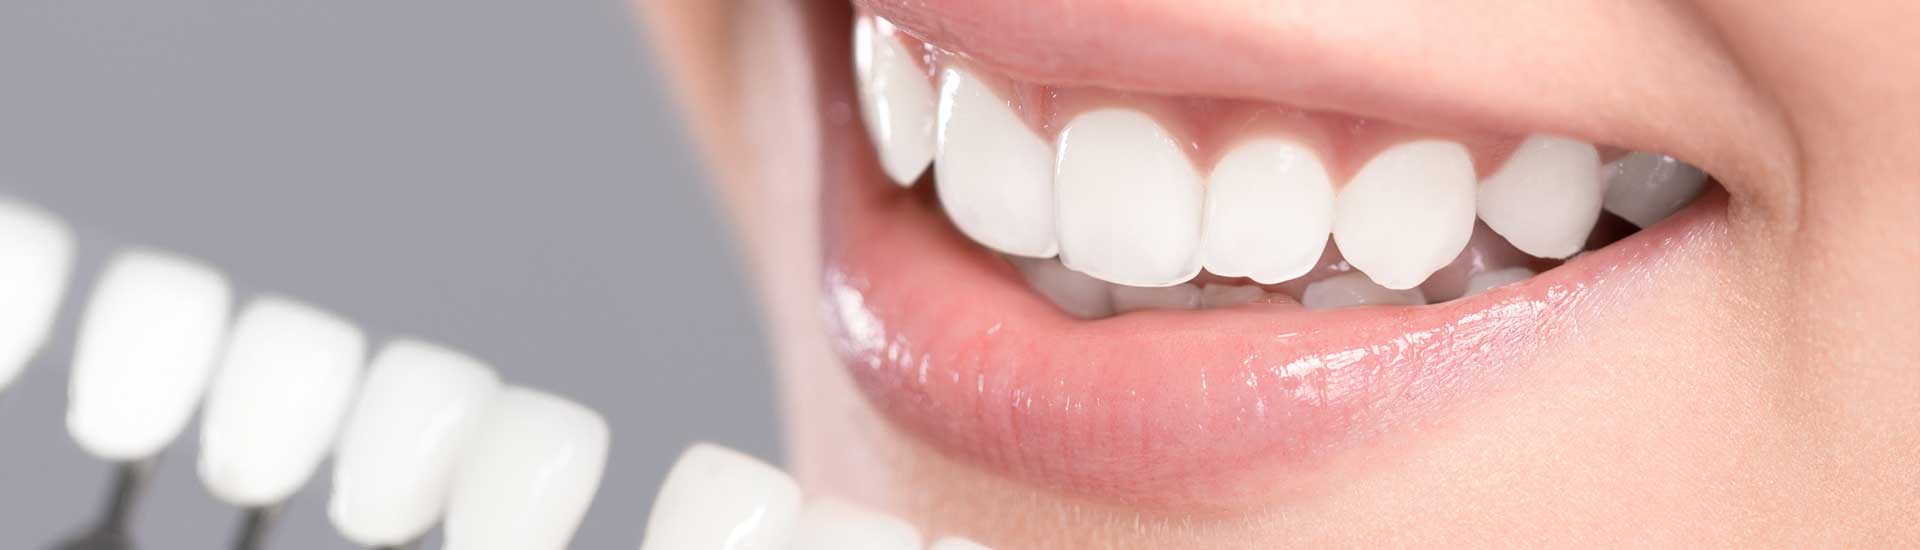 Carillas Dentales Madrid: Composite, Porcelana o Lumineers